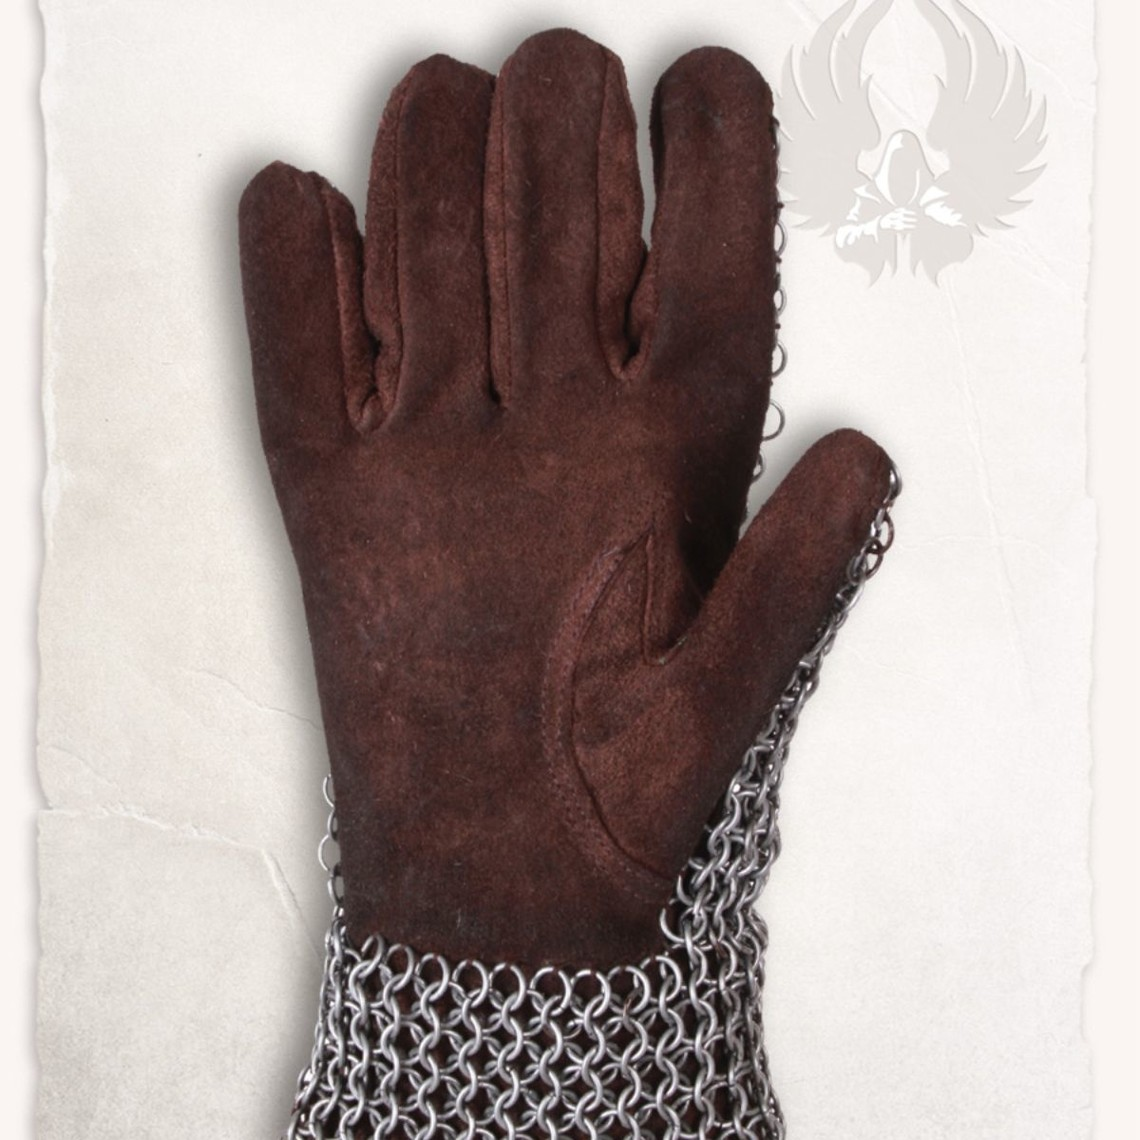 Mytholon Maliënhandschoenen Richard, ongeklonken ronde ringen